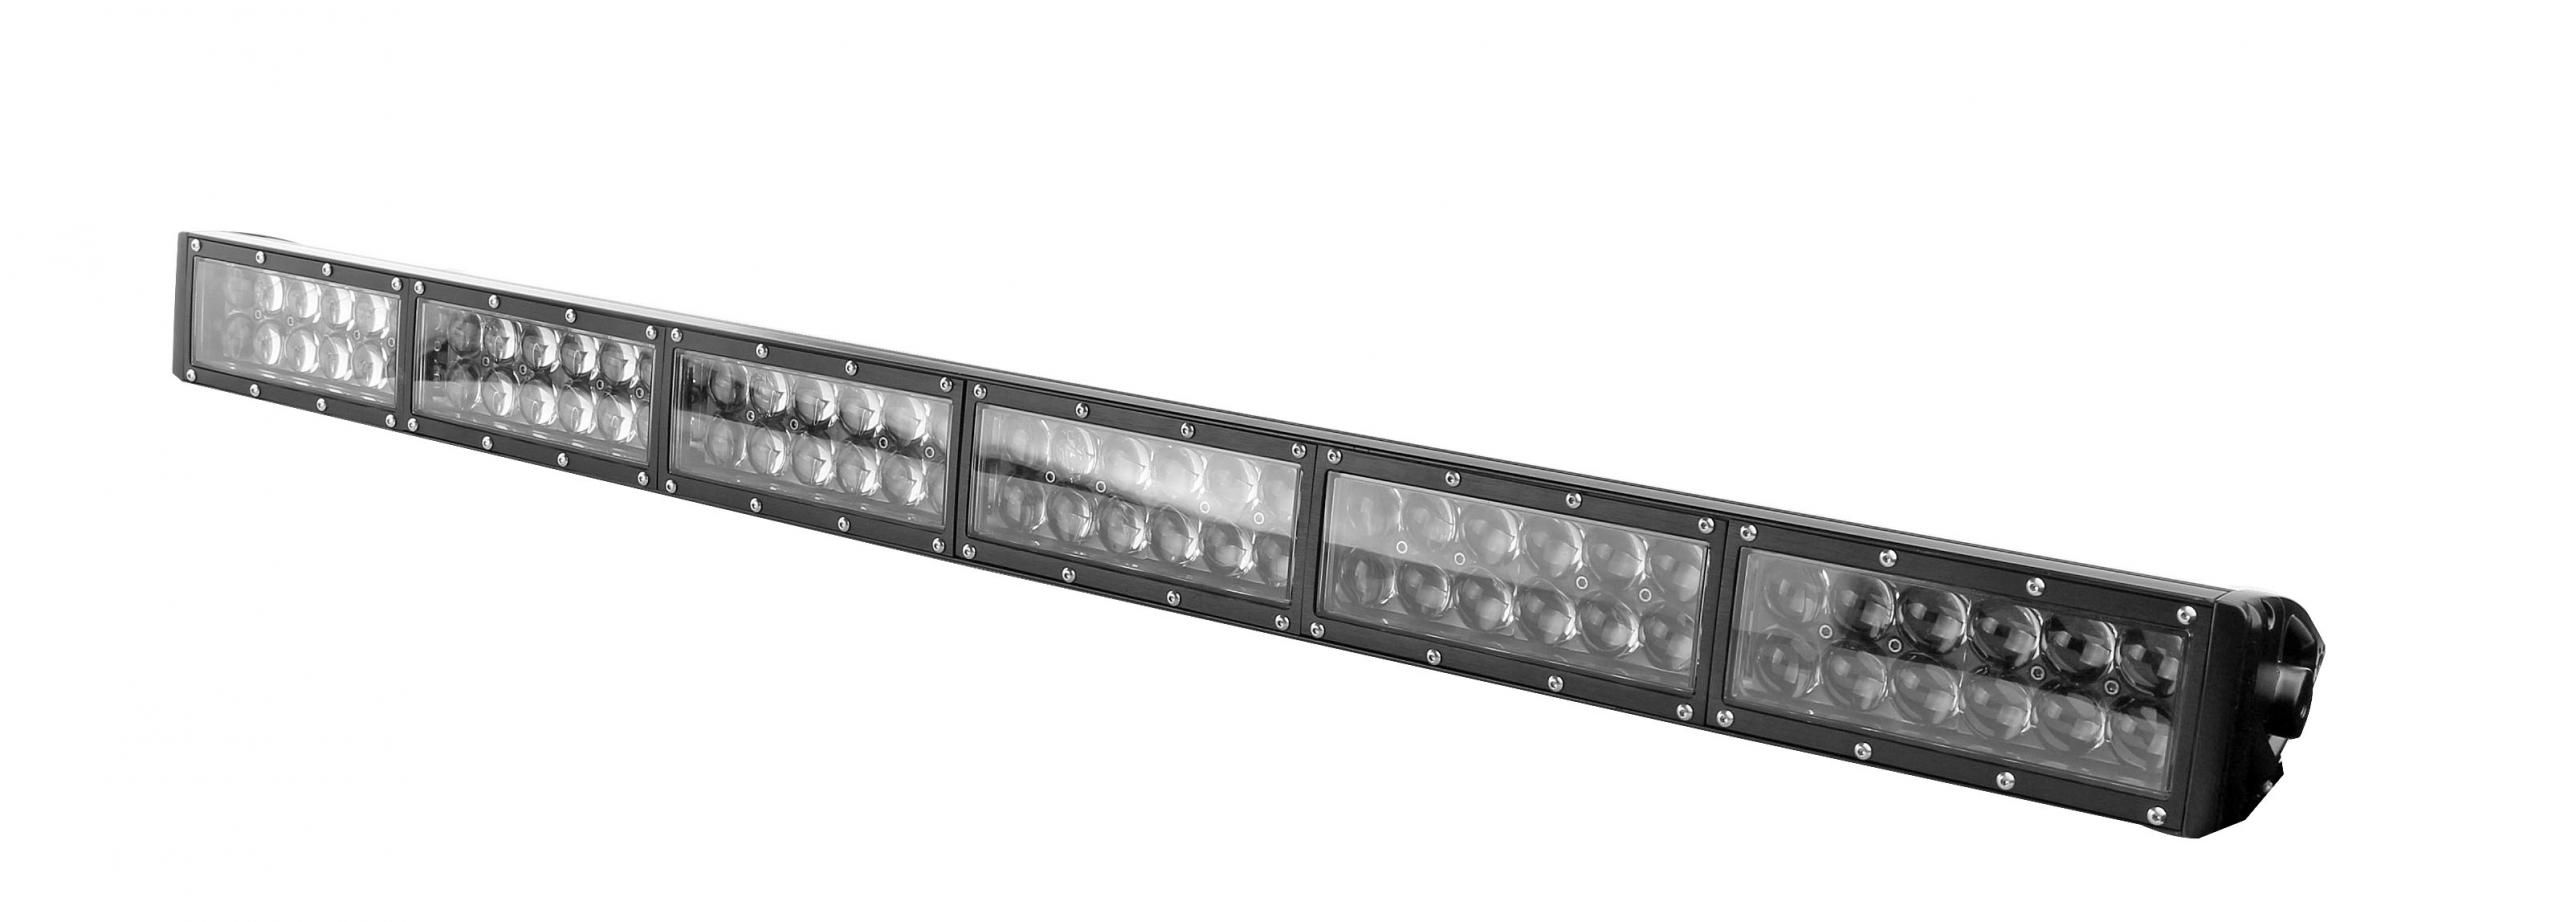 40 led light bar phantom sun 588w https4lowparts 40 led light bar phantom sun 588w httpswww mozeypictures Images